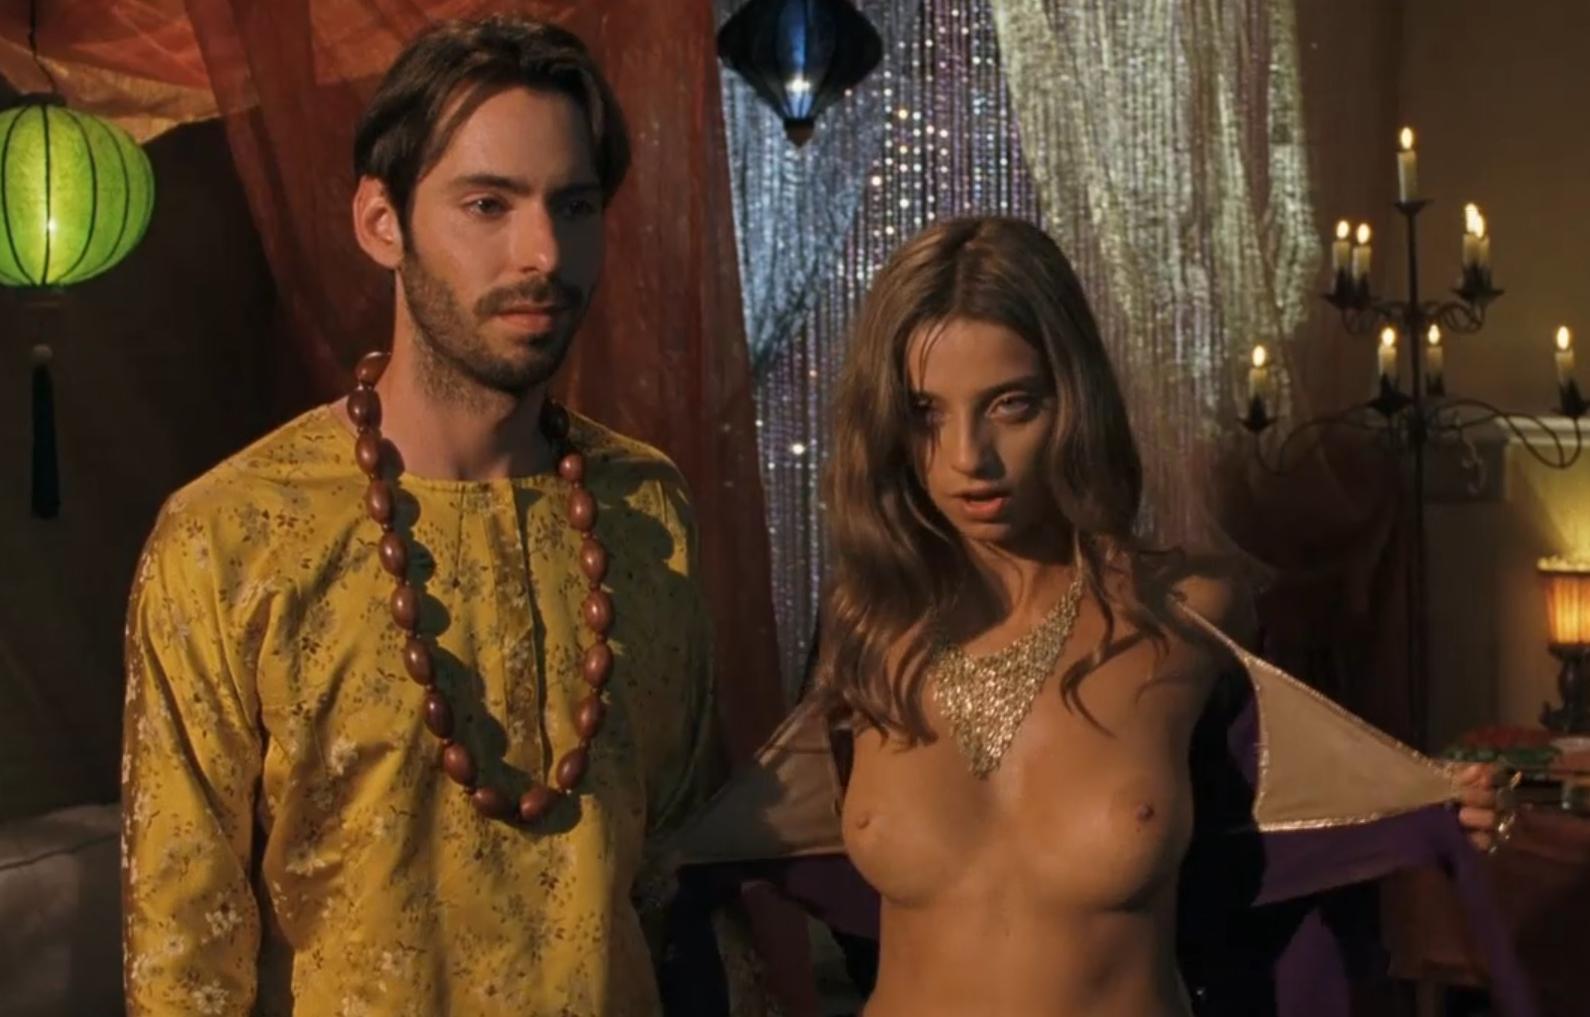 100 Pictures of Angela Sarafyan Sex Scene